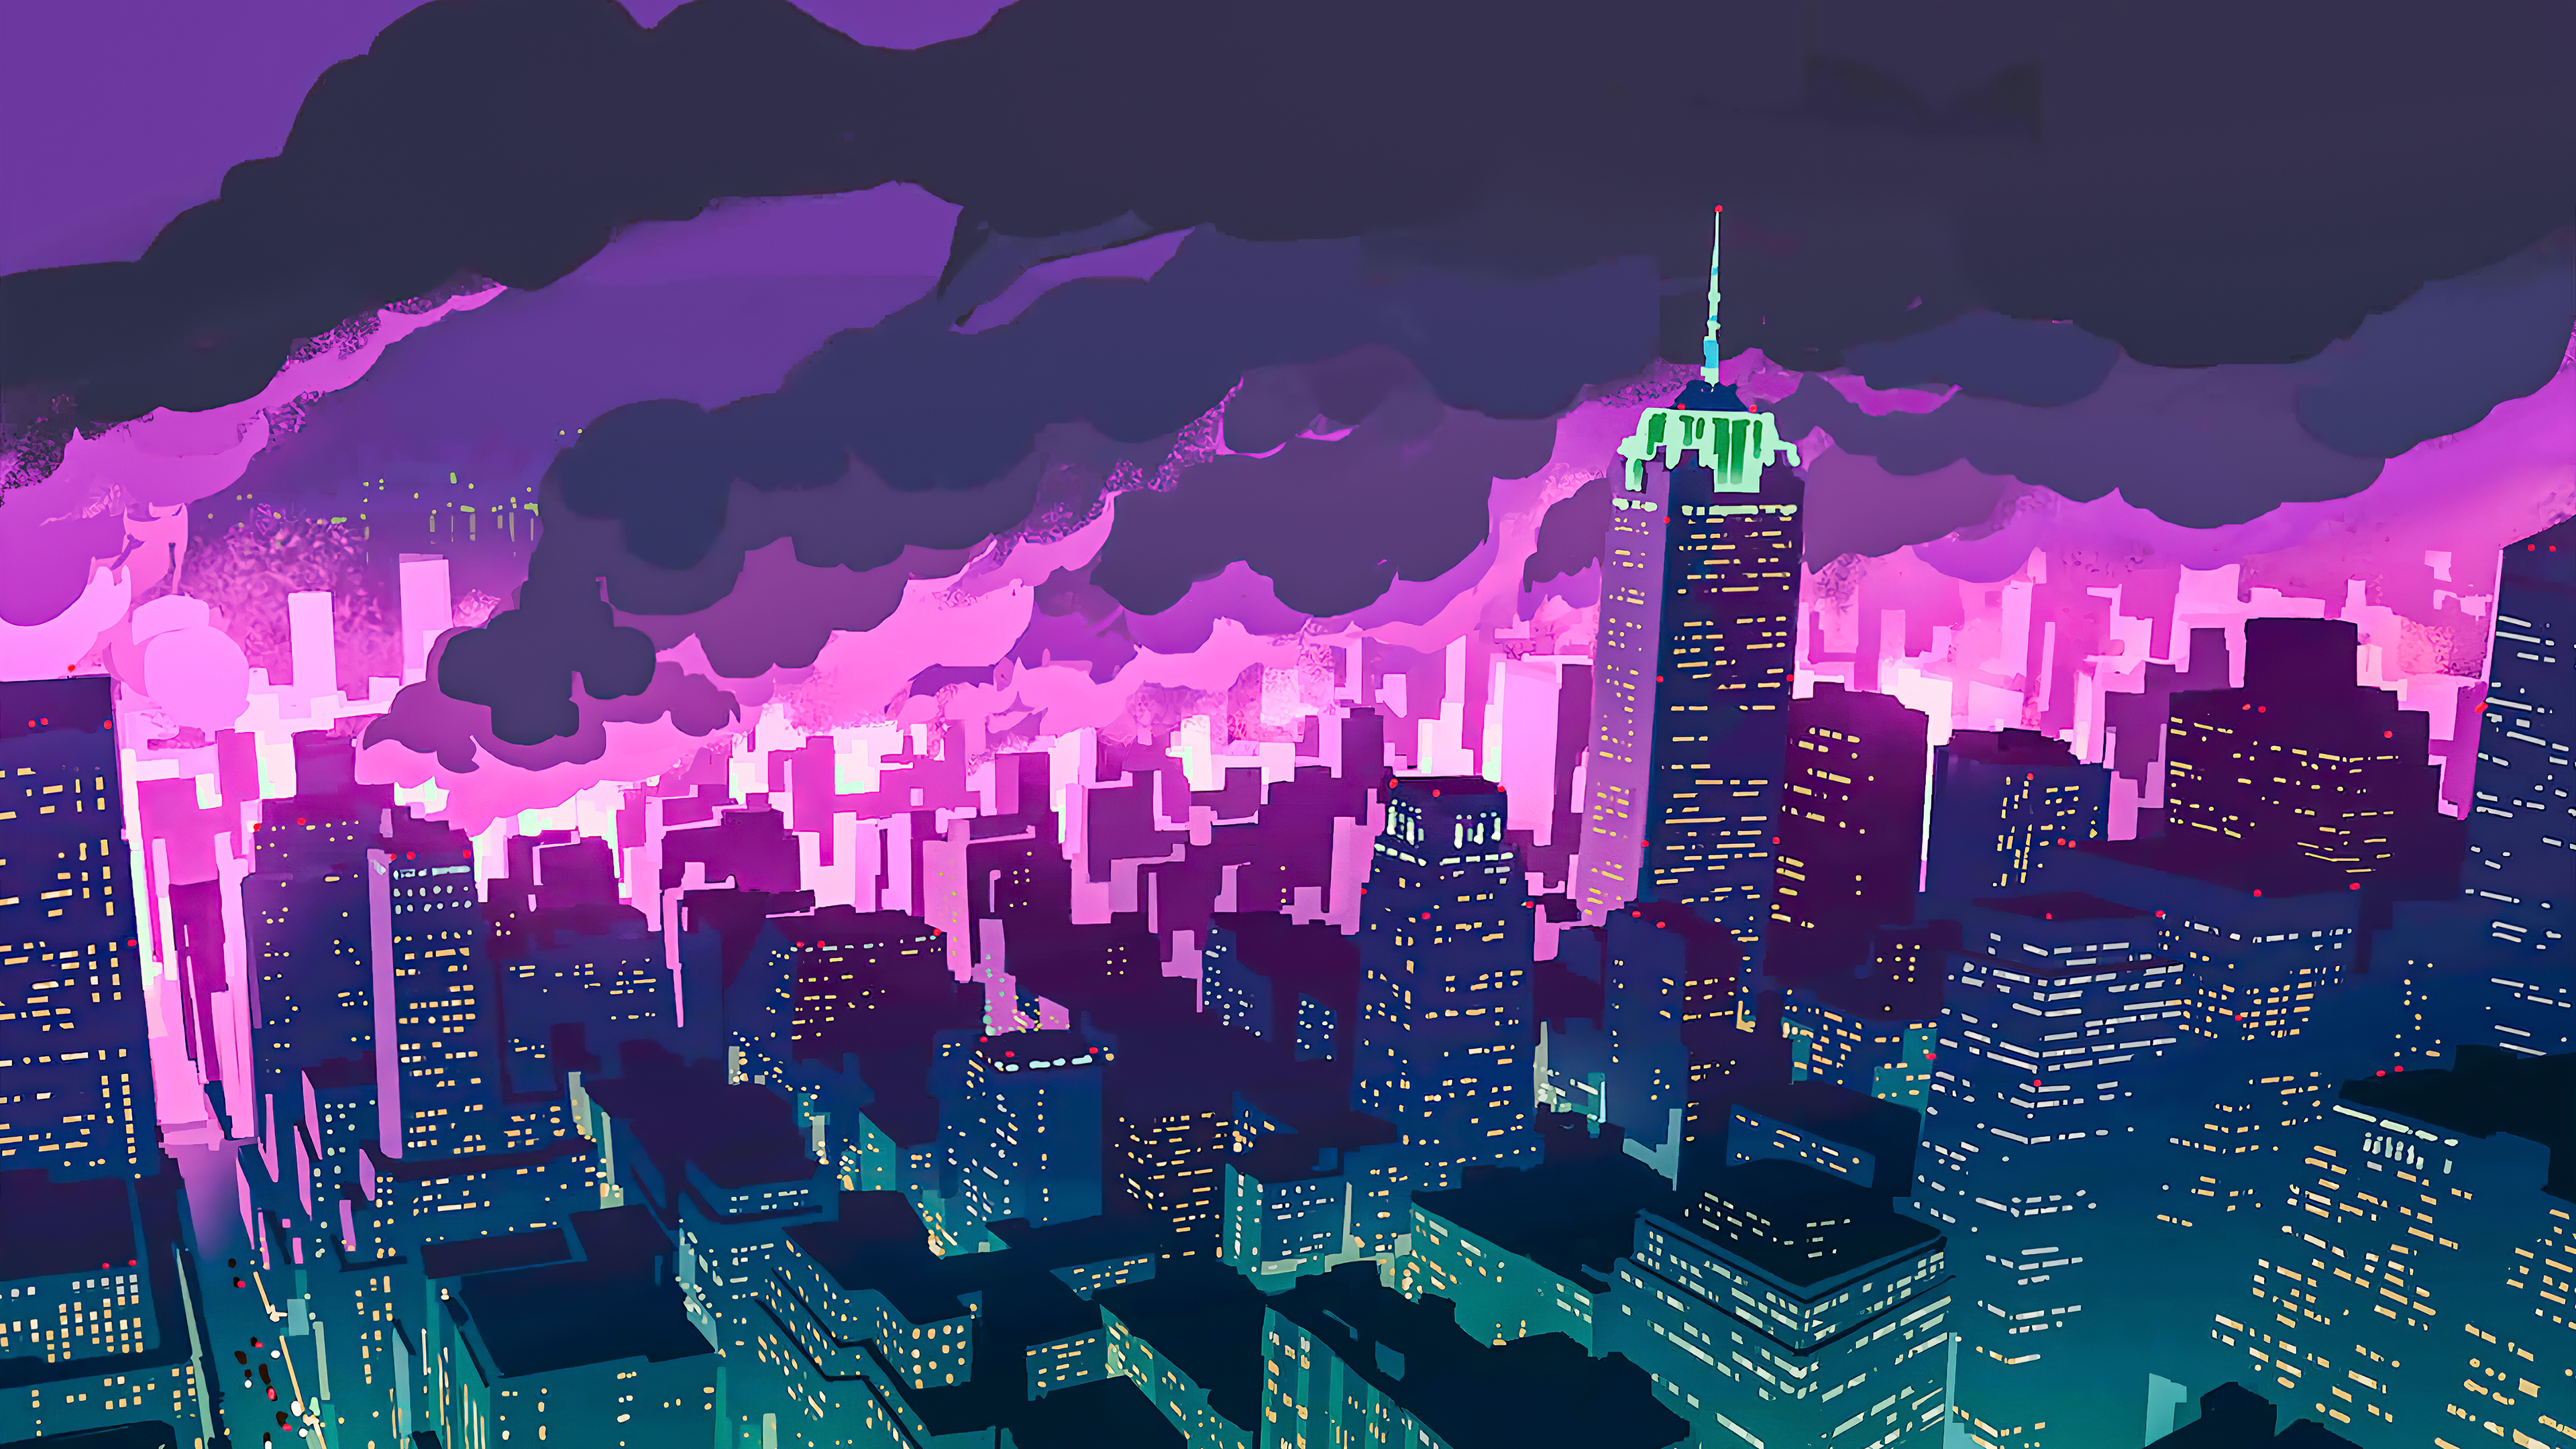 Promare Night City [3840x2160] in 2020 Anime city, Anime